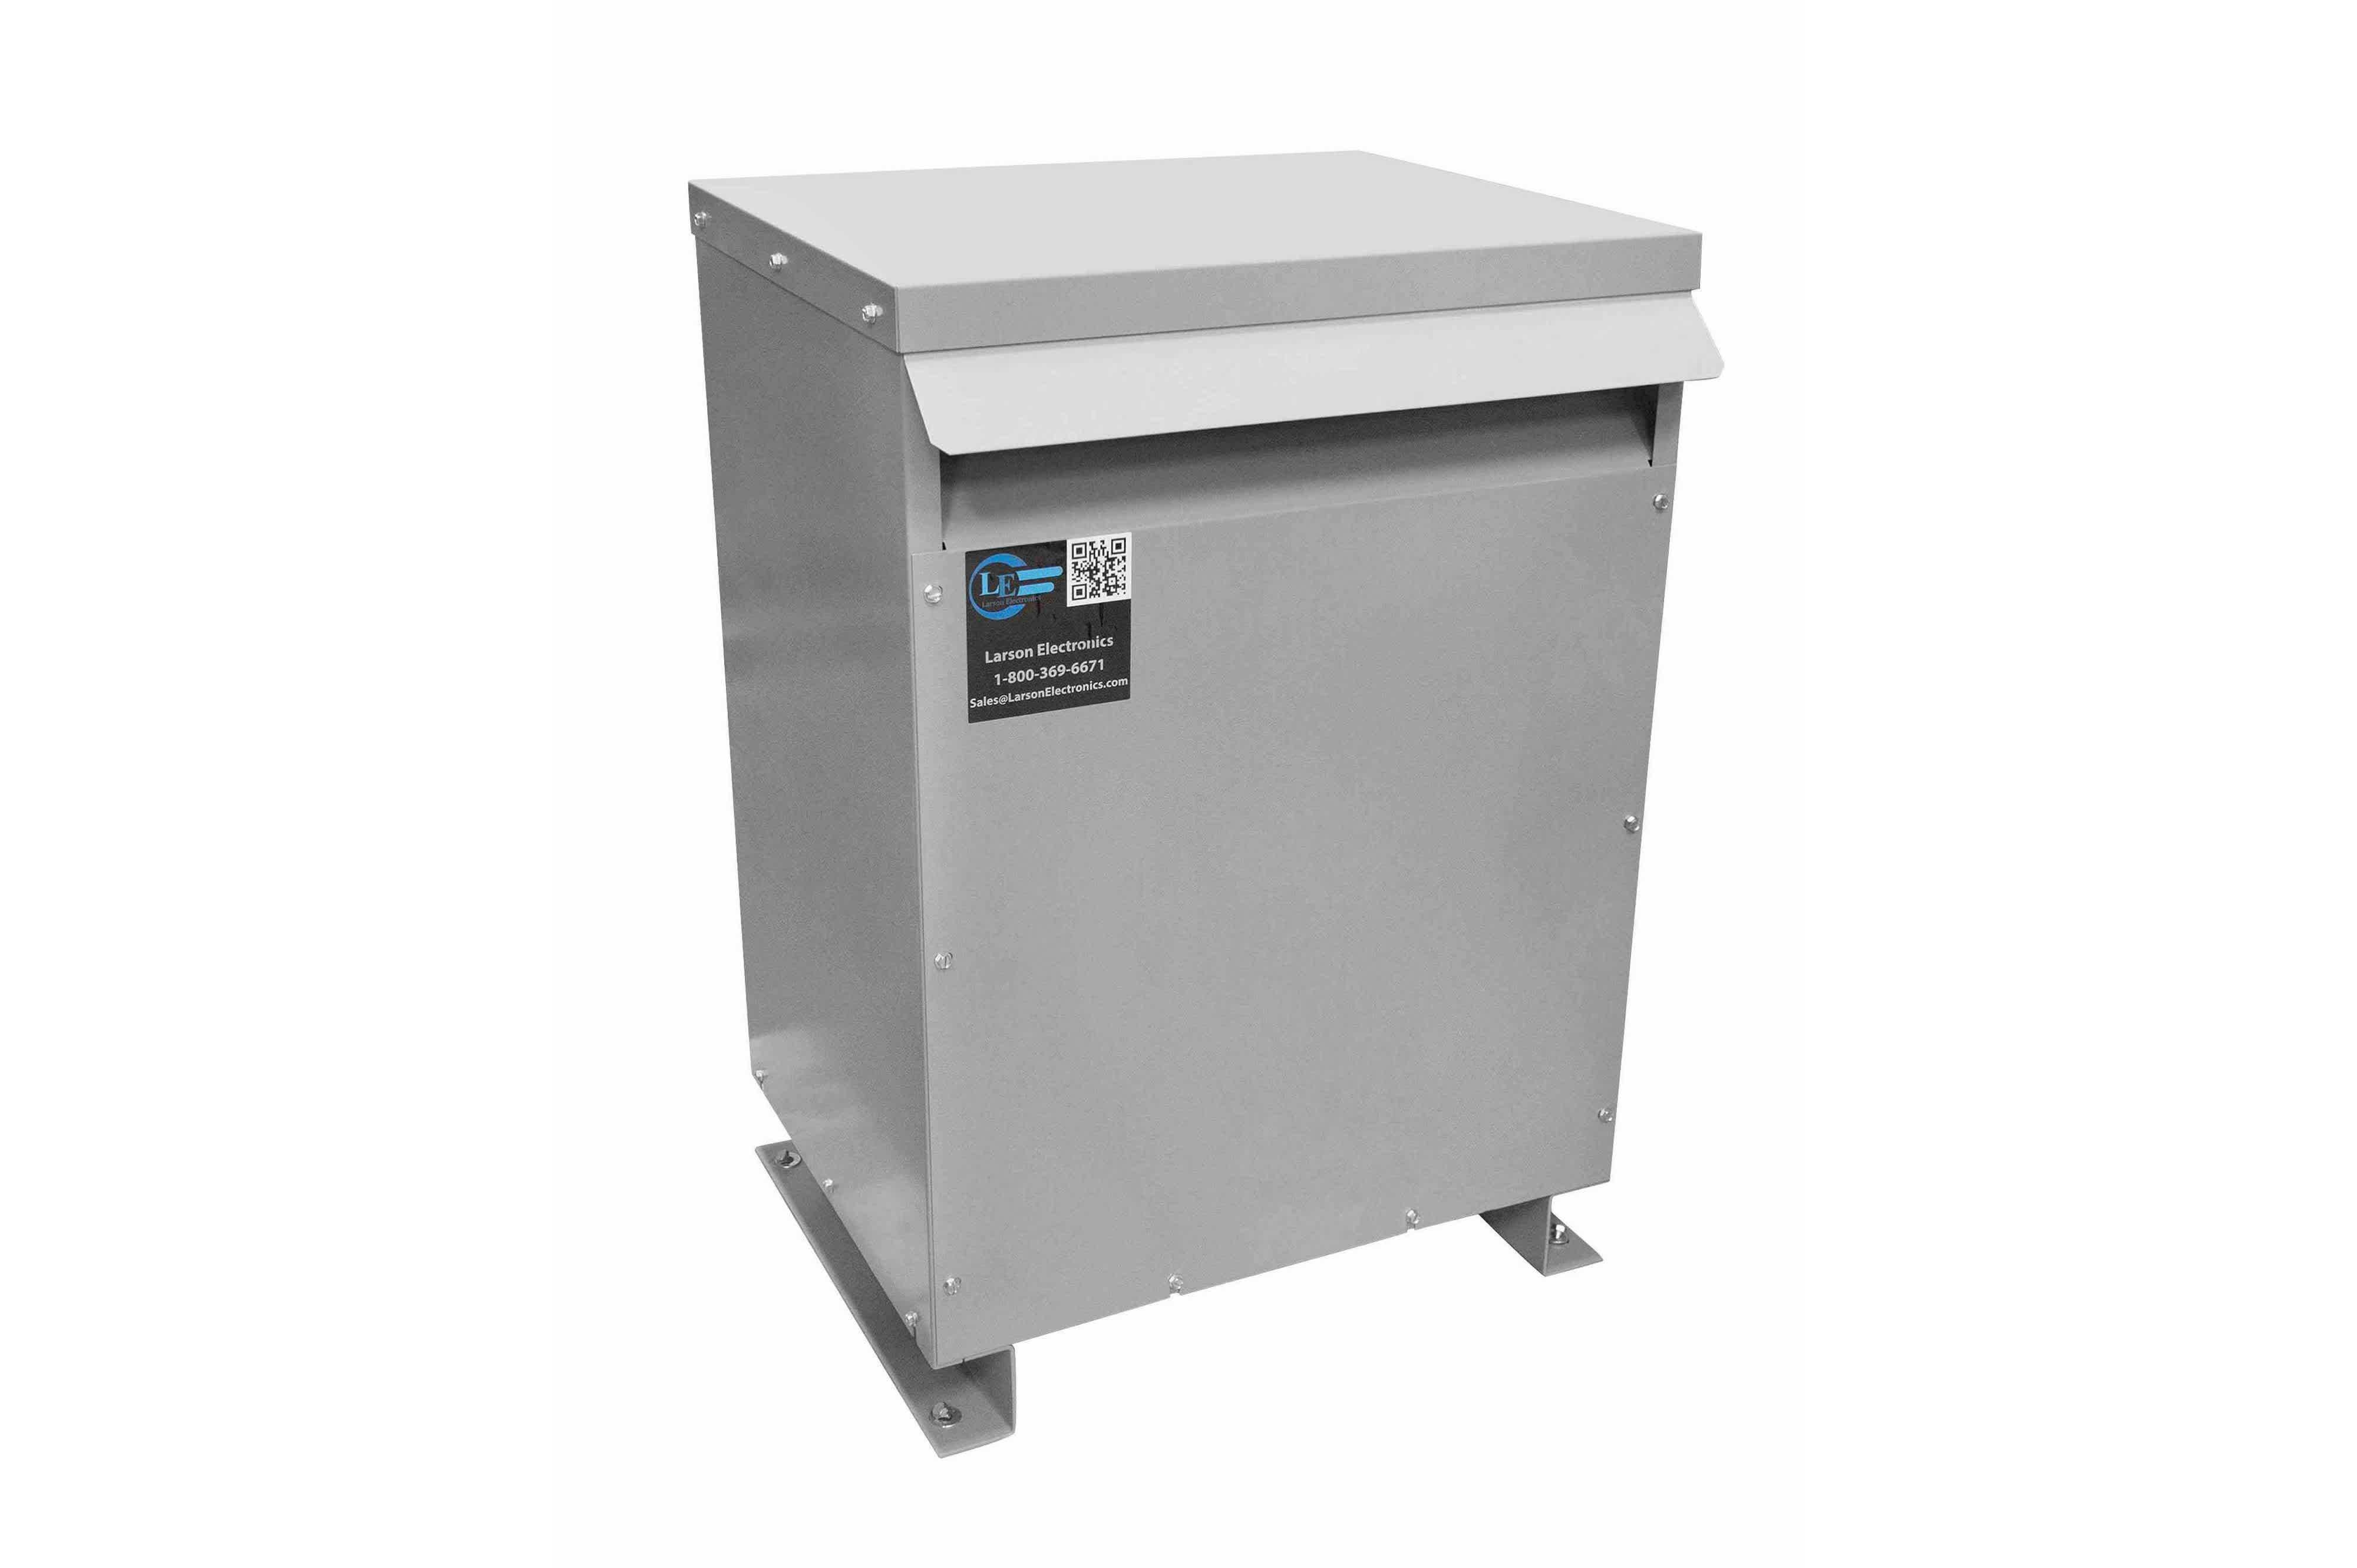 35 kVA 3PH Isolation Transformer, 480V Wye Primary, 575Y/332 Wye-N Secondary, N3R, Ventilated, 60 Hz